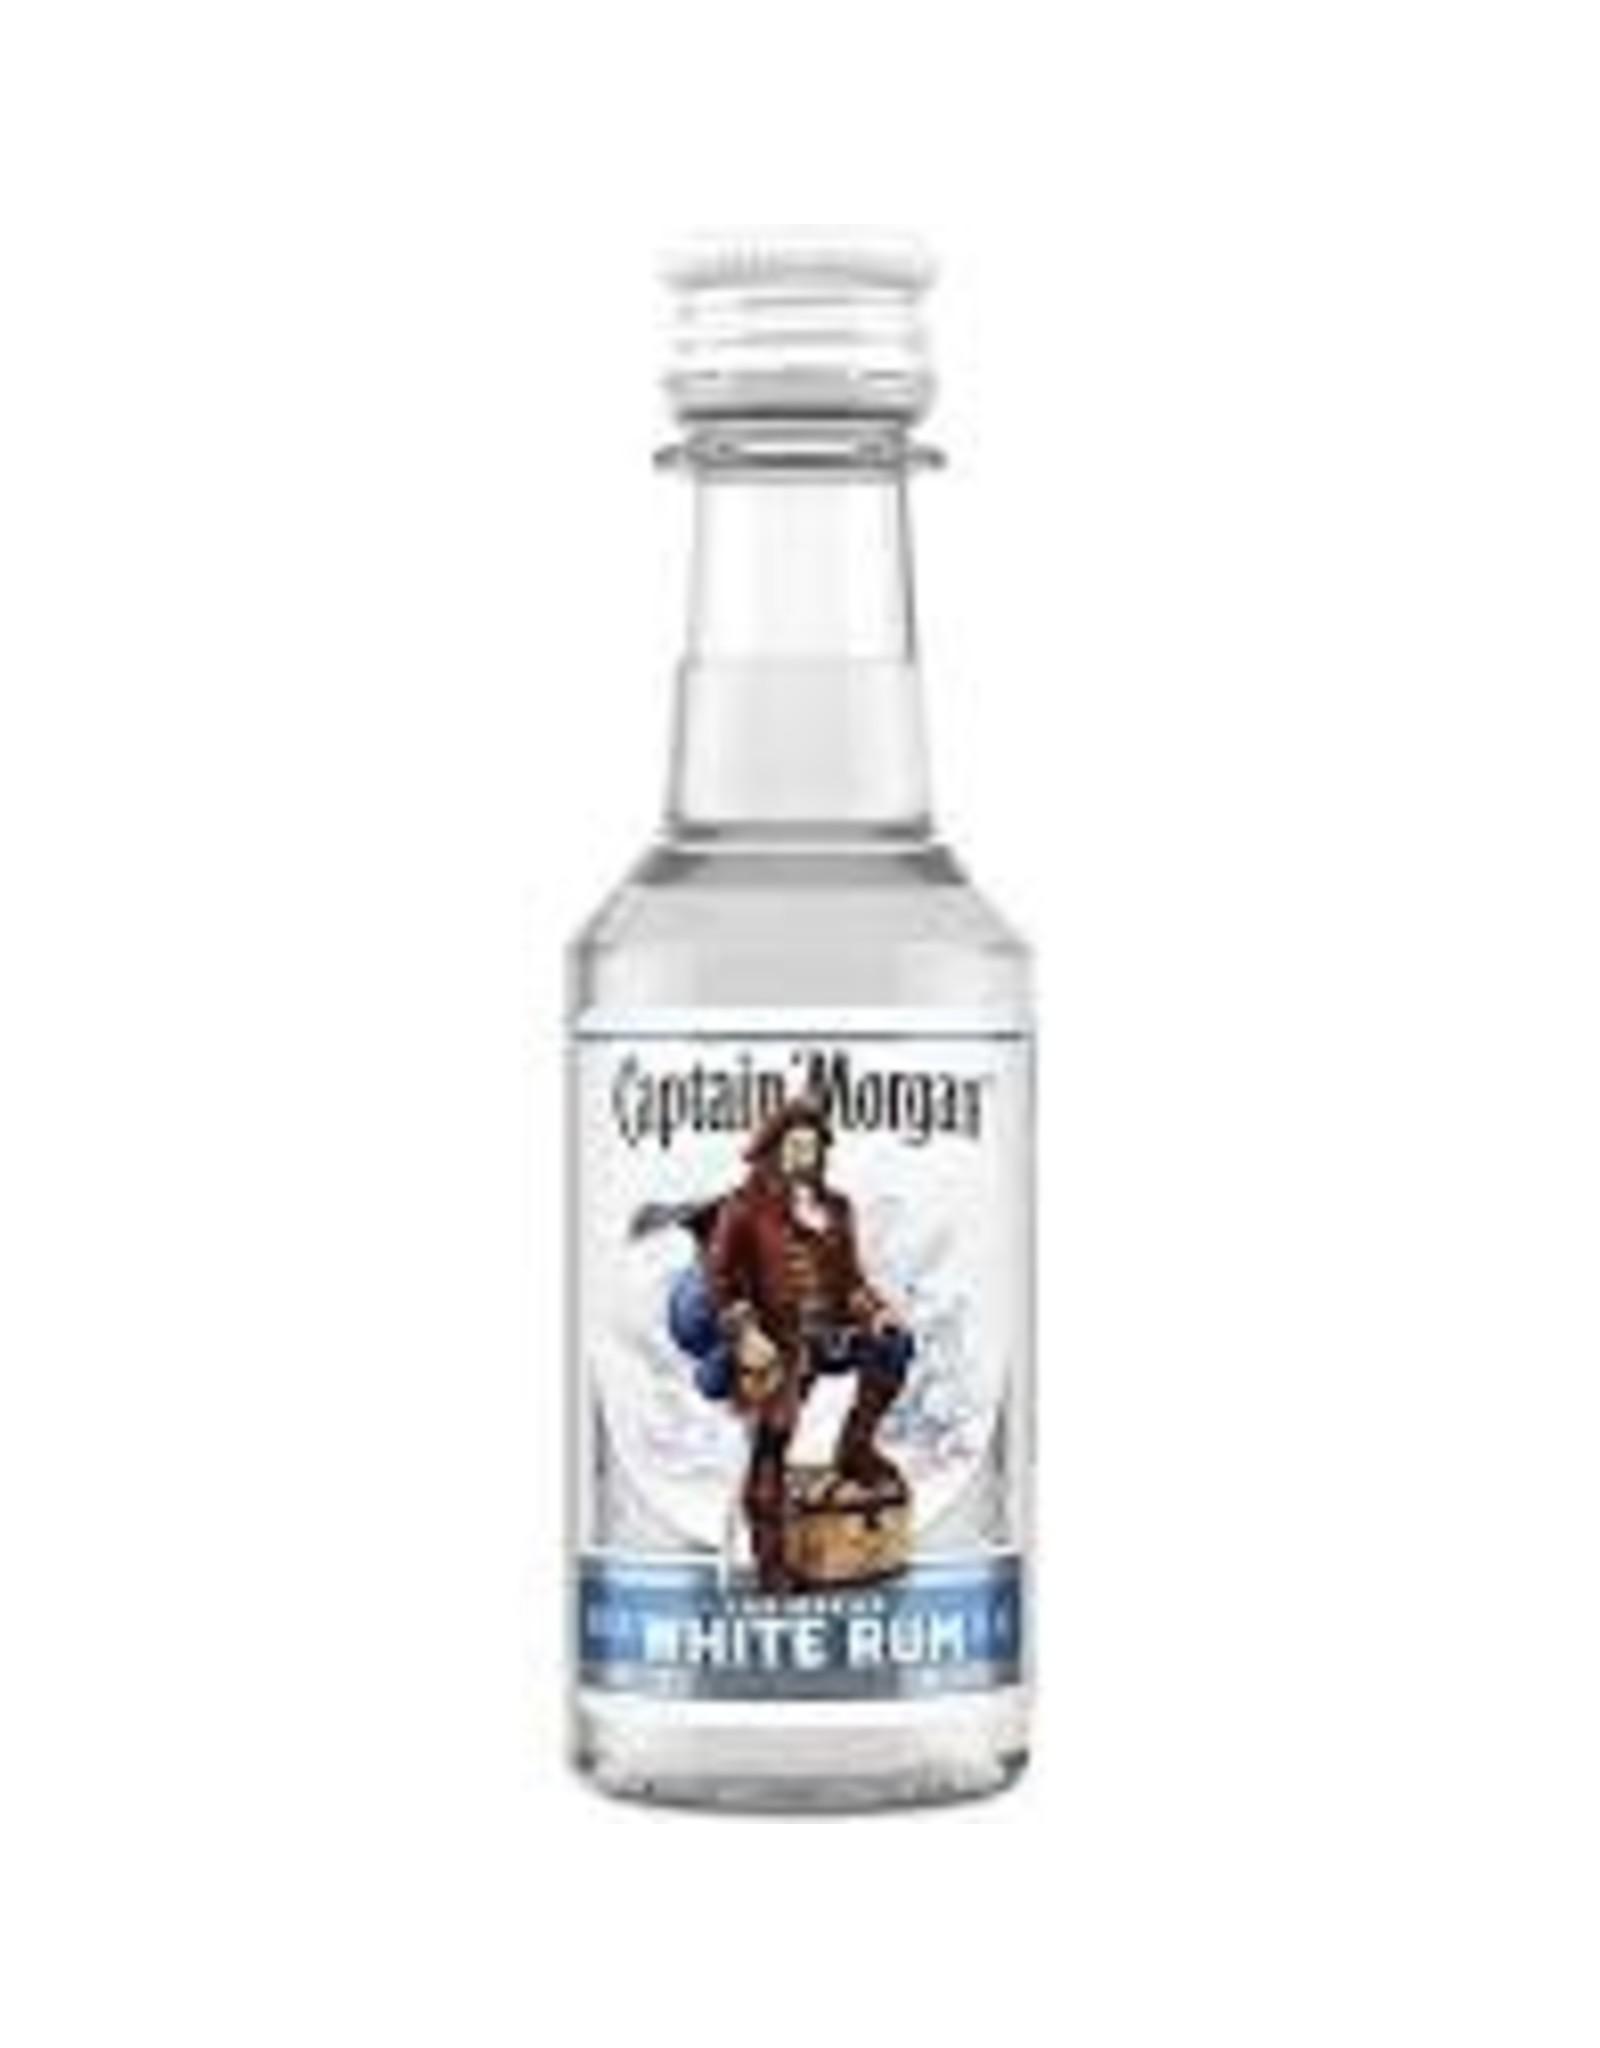 CAPTAIN MORGAN WHITE RUM 50ML